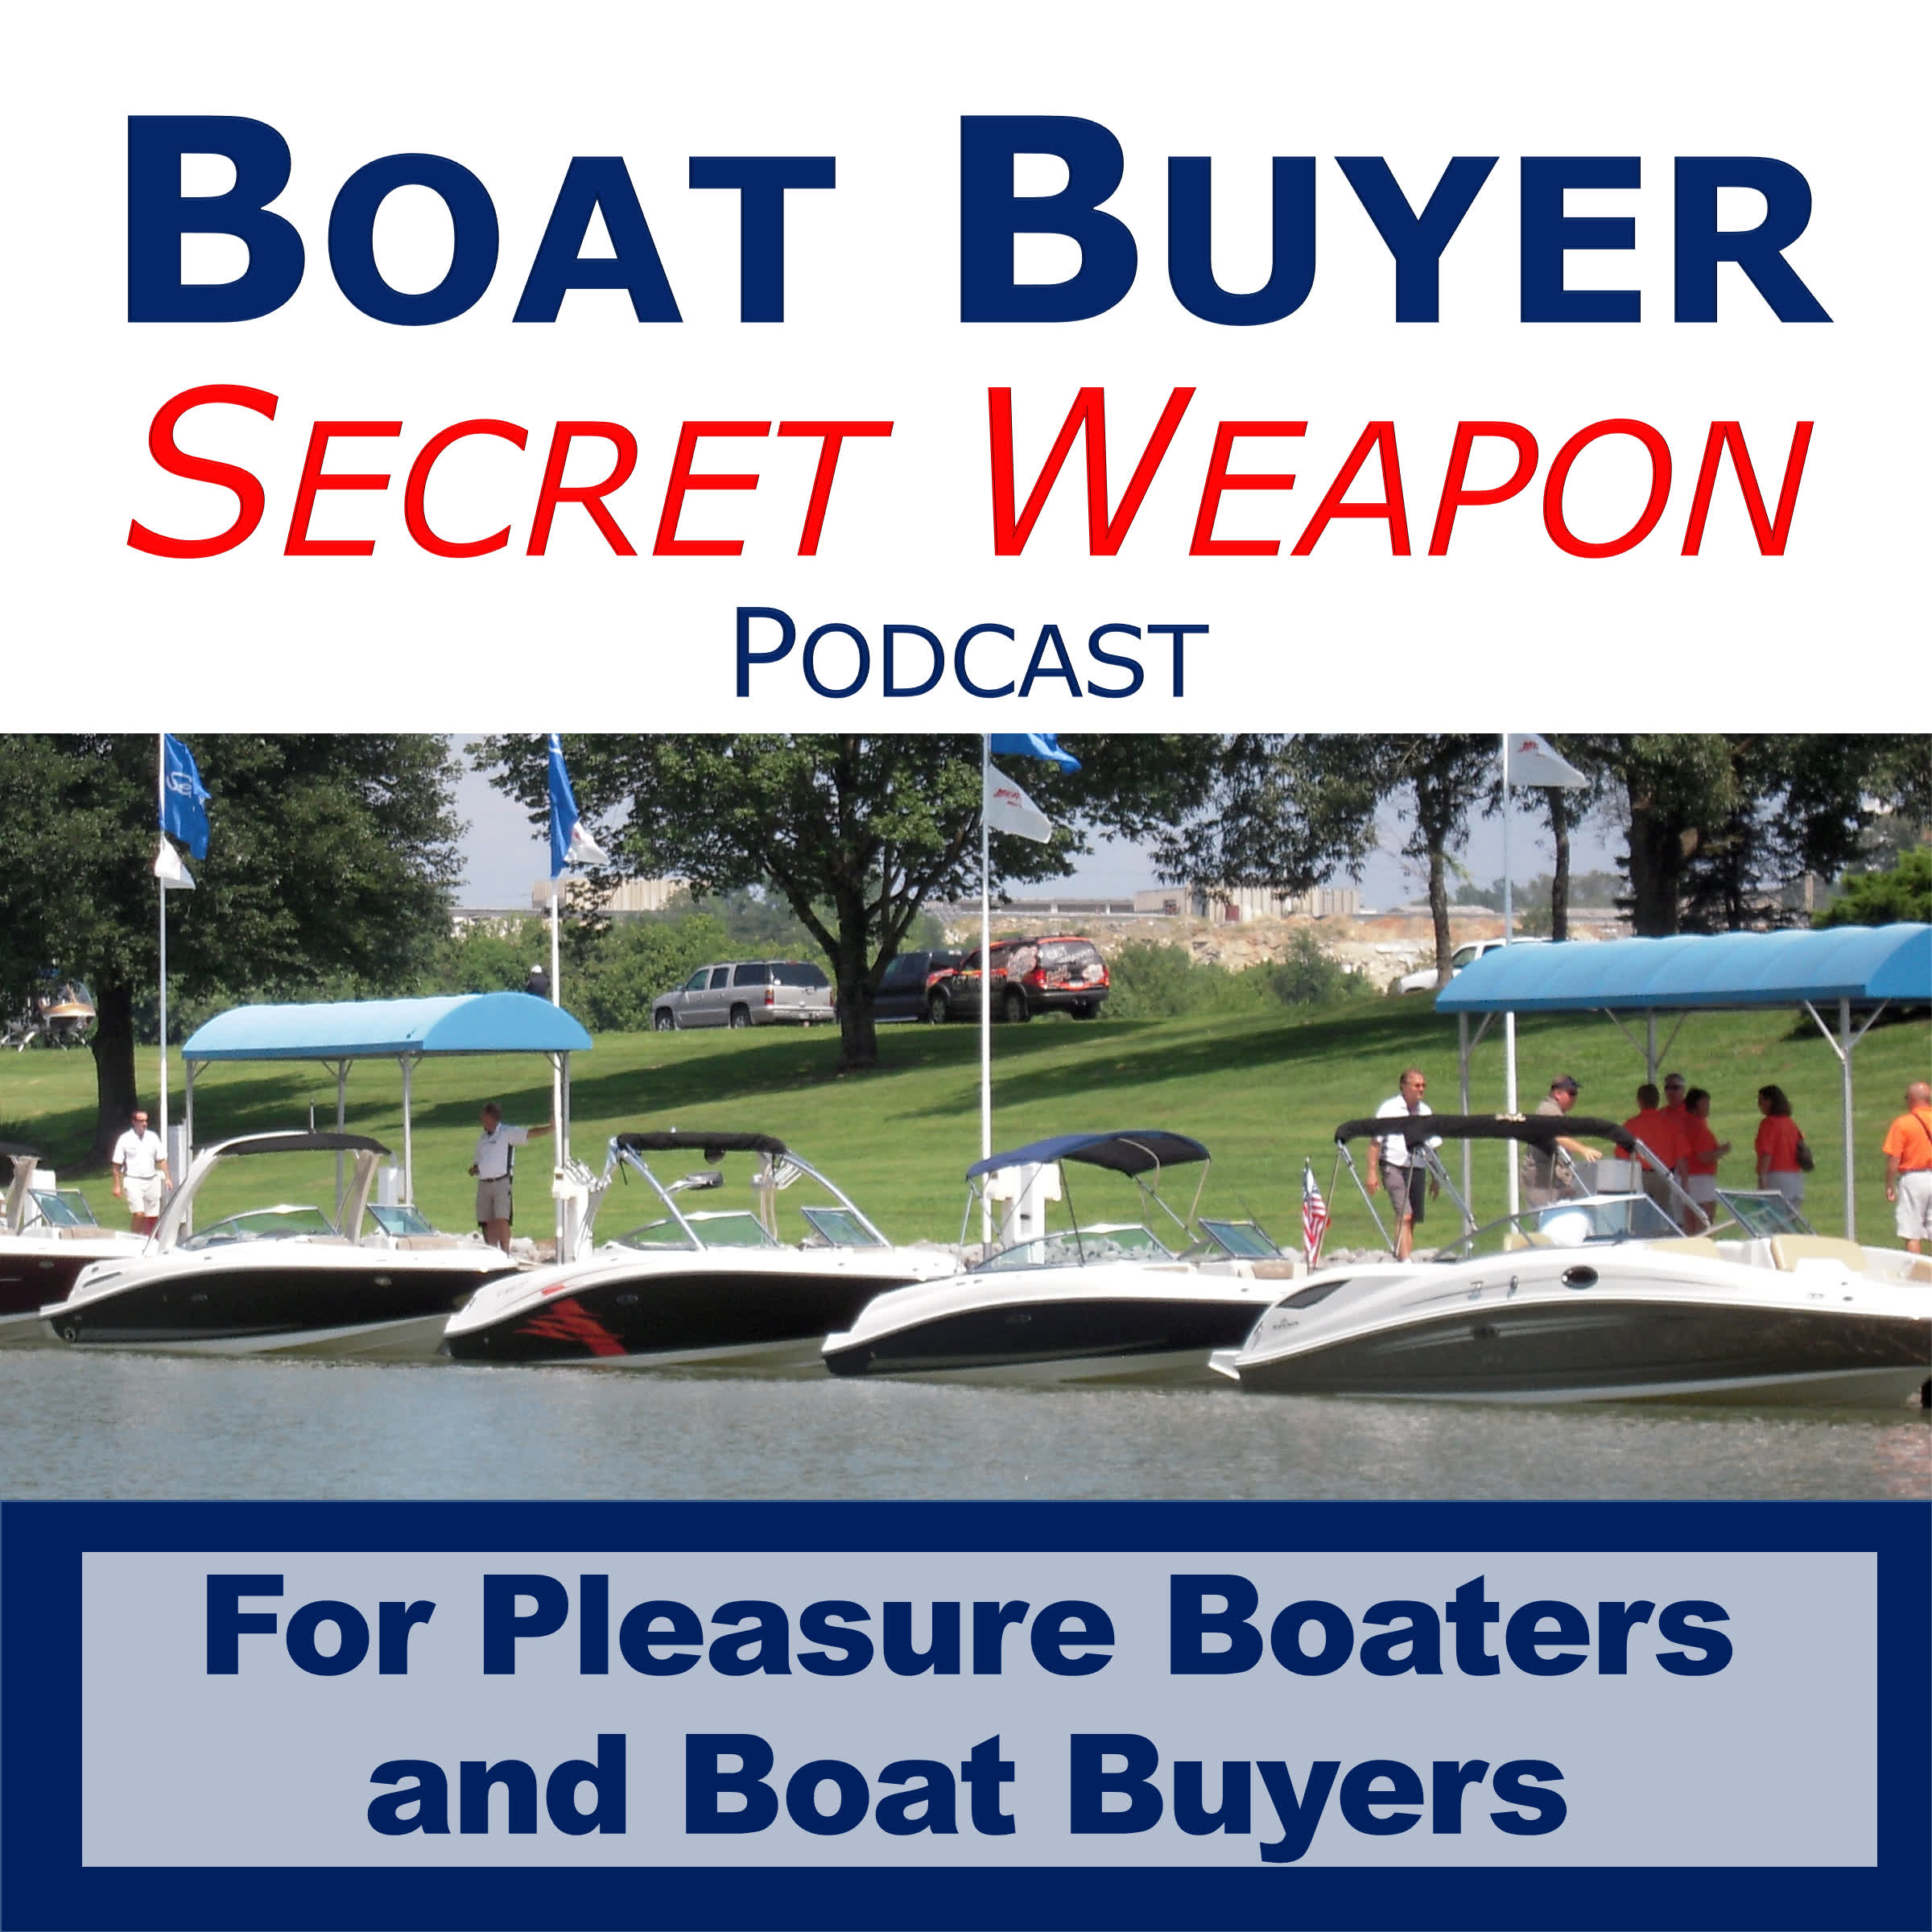 Boat Buyer's Secret Weapon Podcast show art